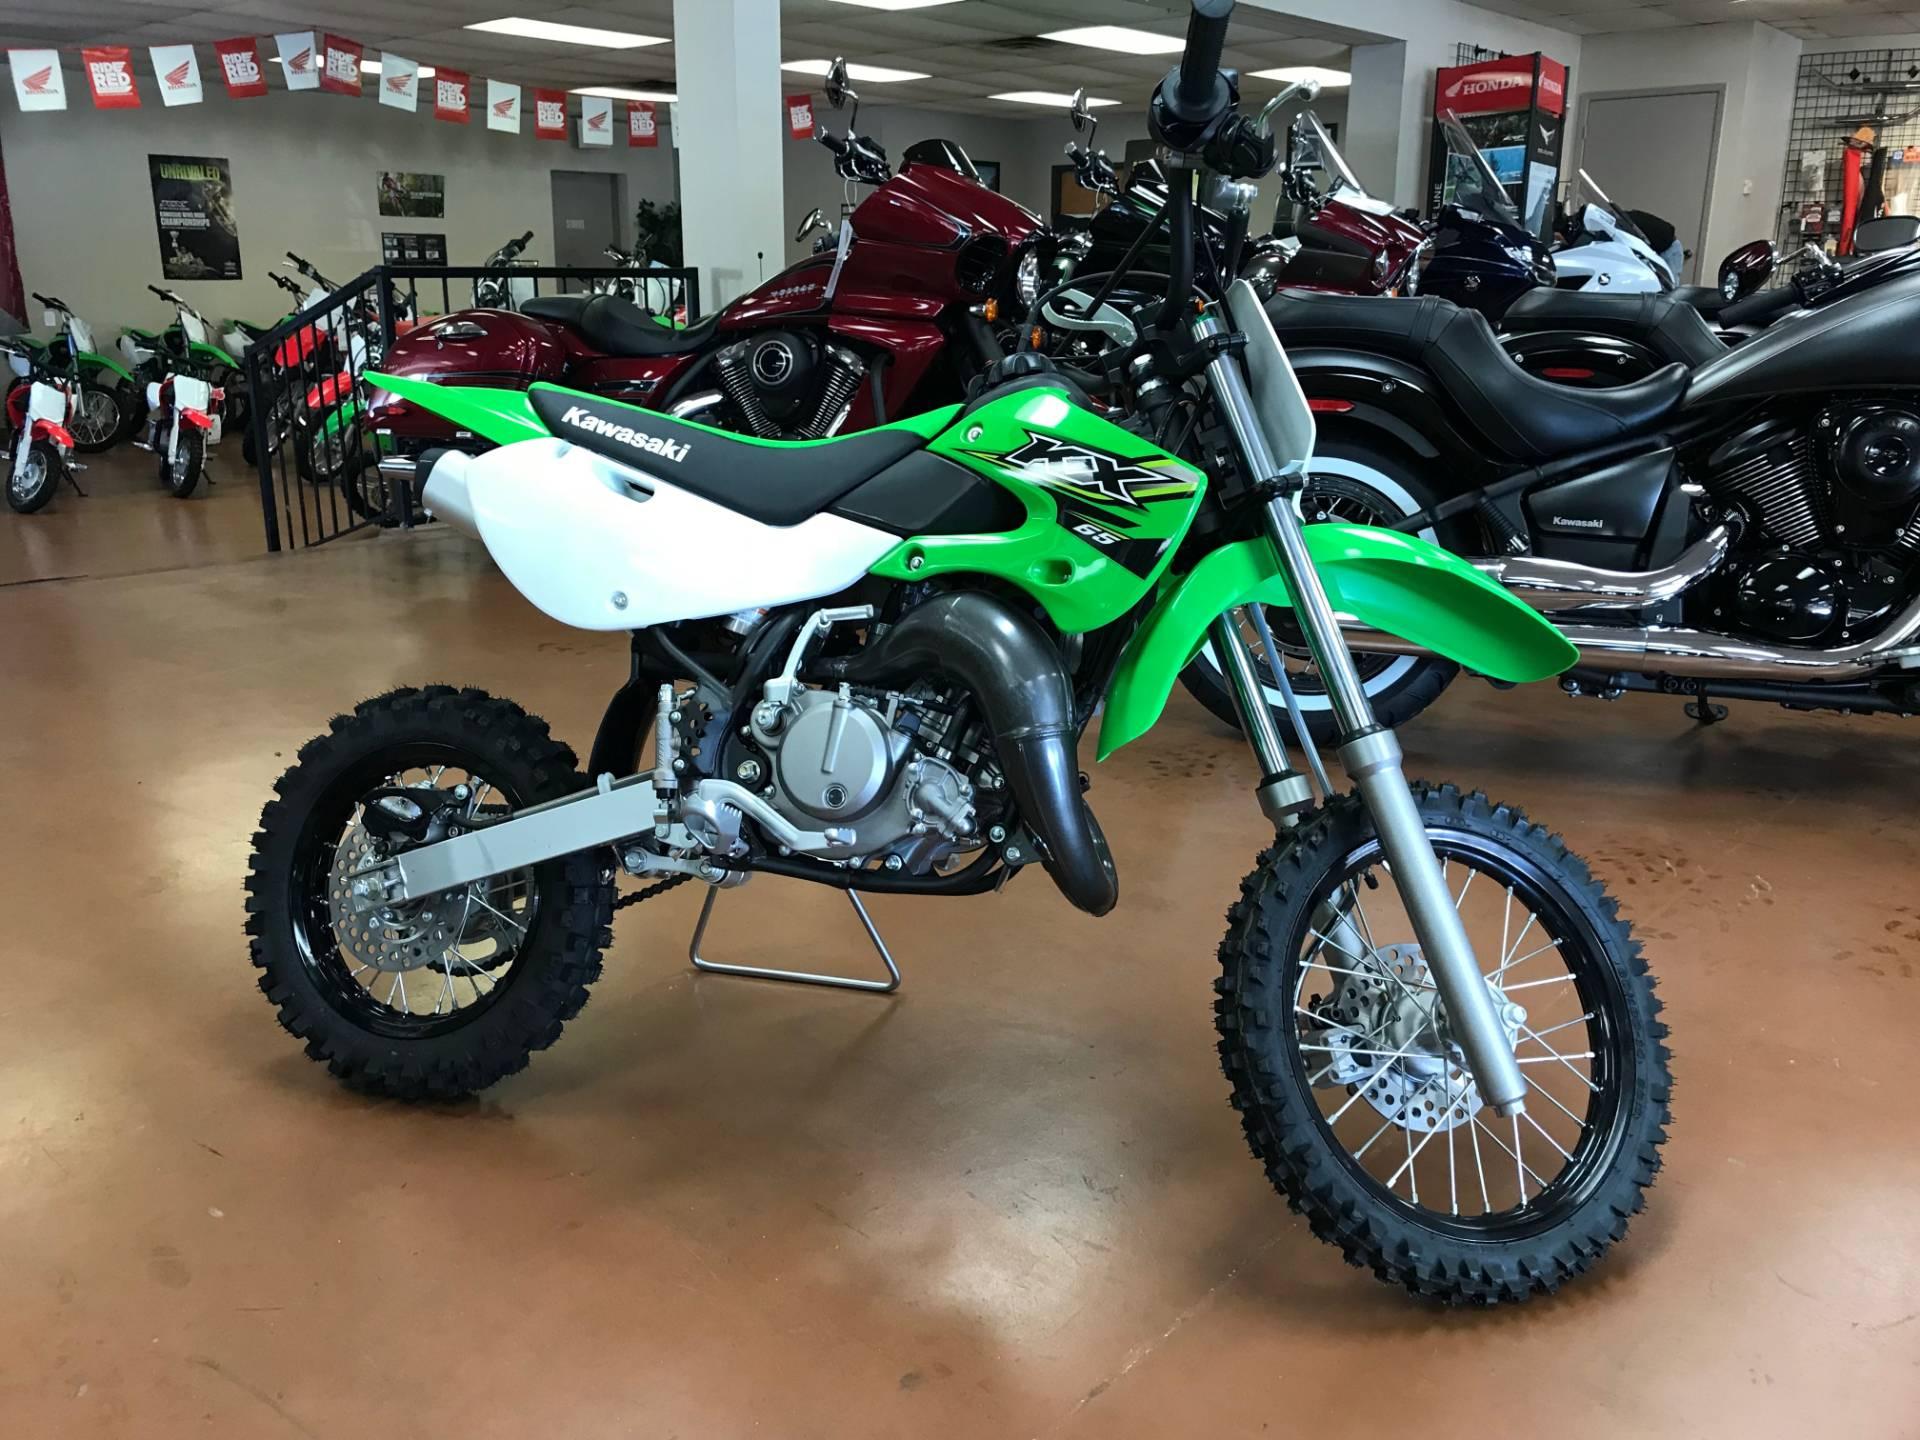 2017 Kawasaki KX65 in Arlington, Texas